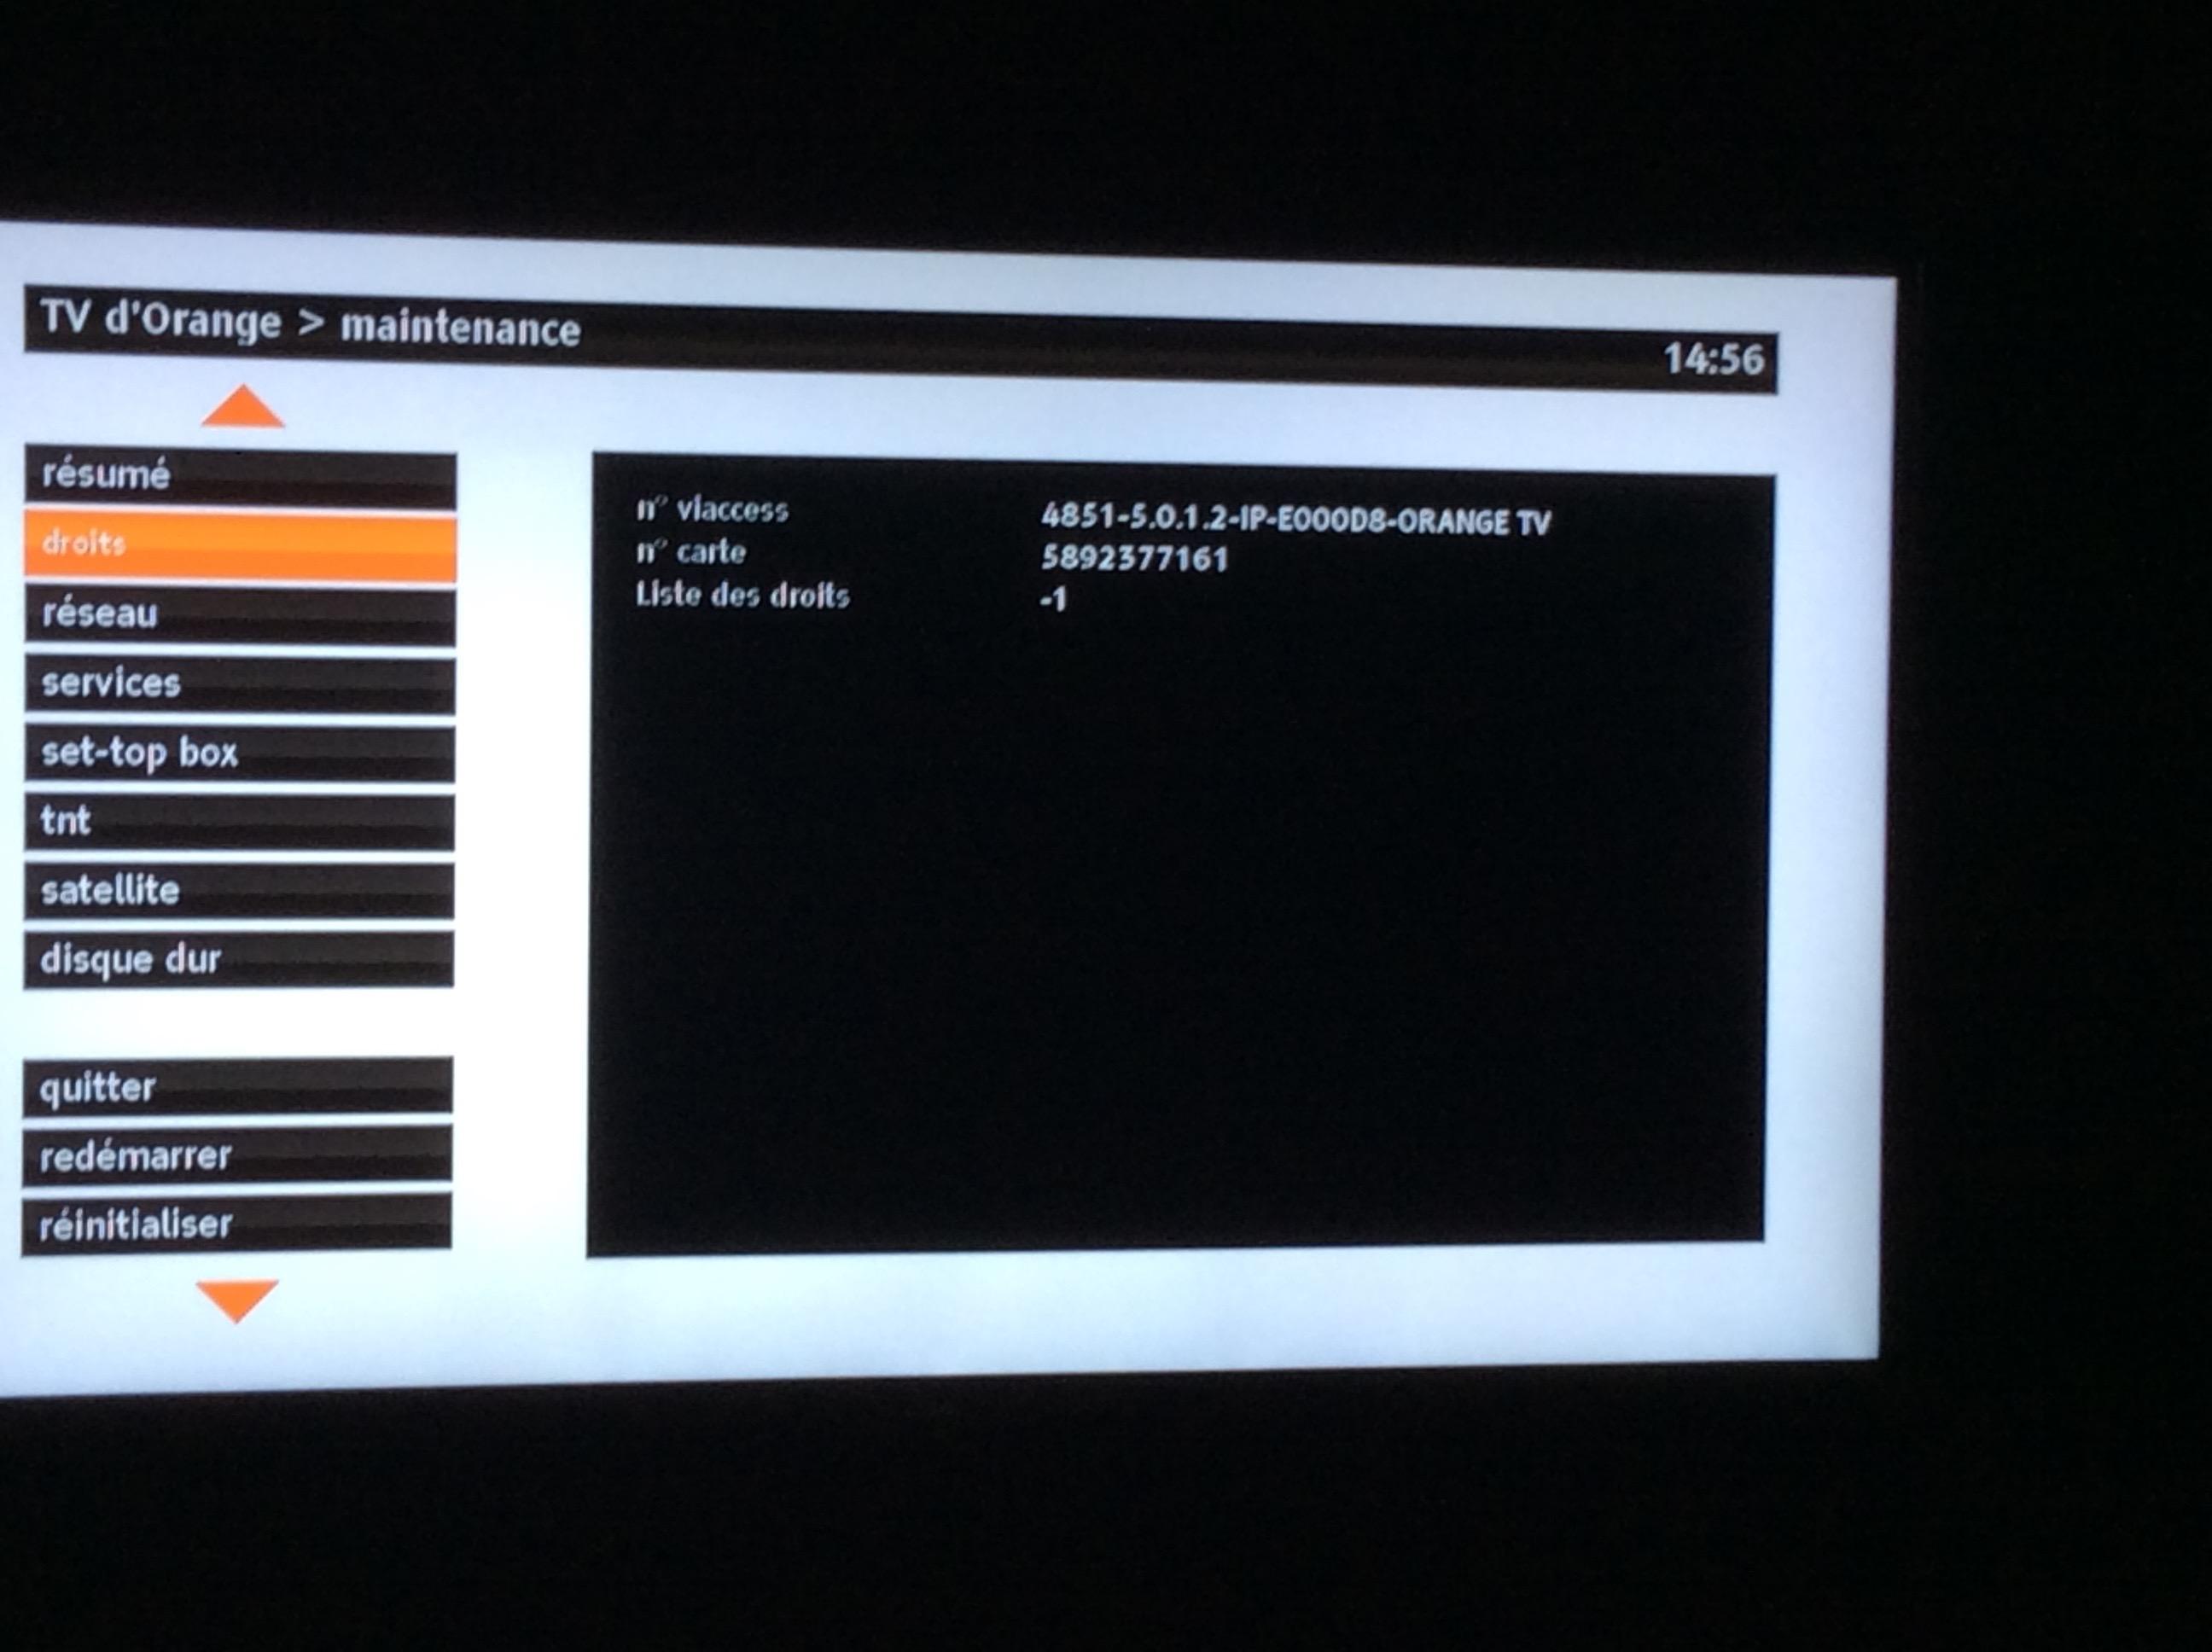 carte d 39 acces tv communaut orange. Black Bedroom Furniture Sets. Home Design Ideas